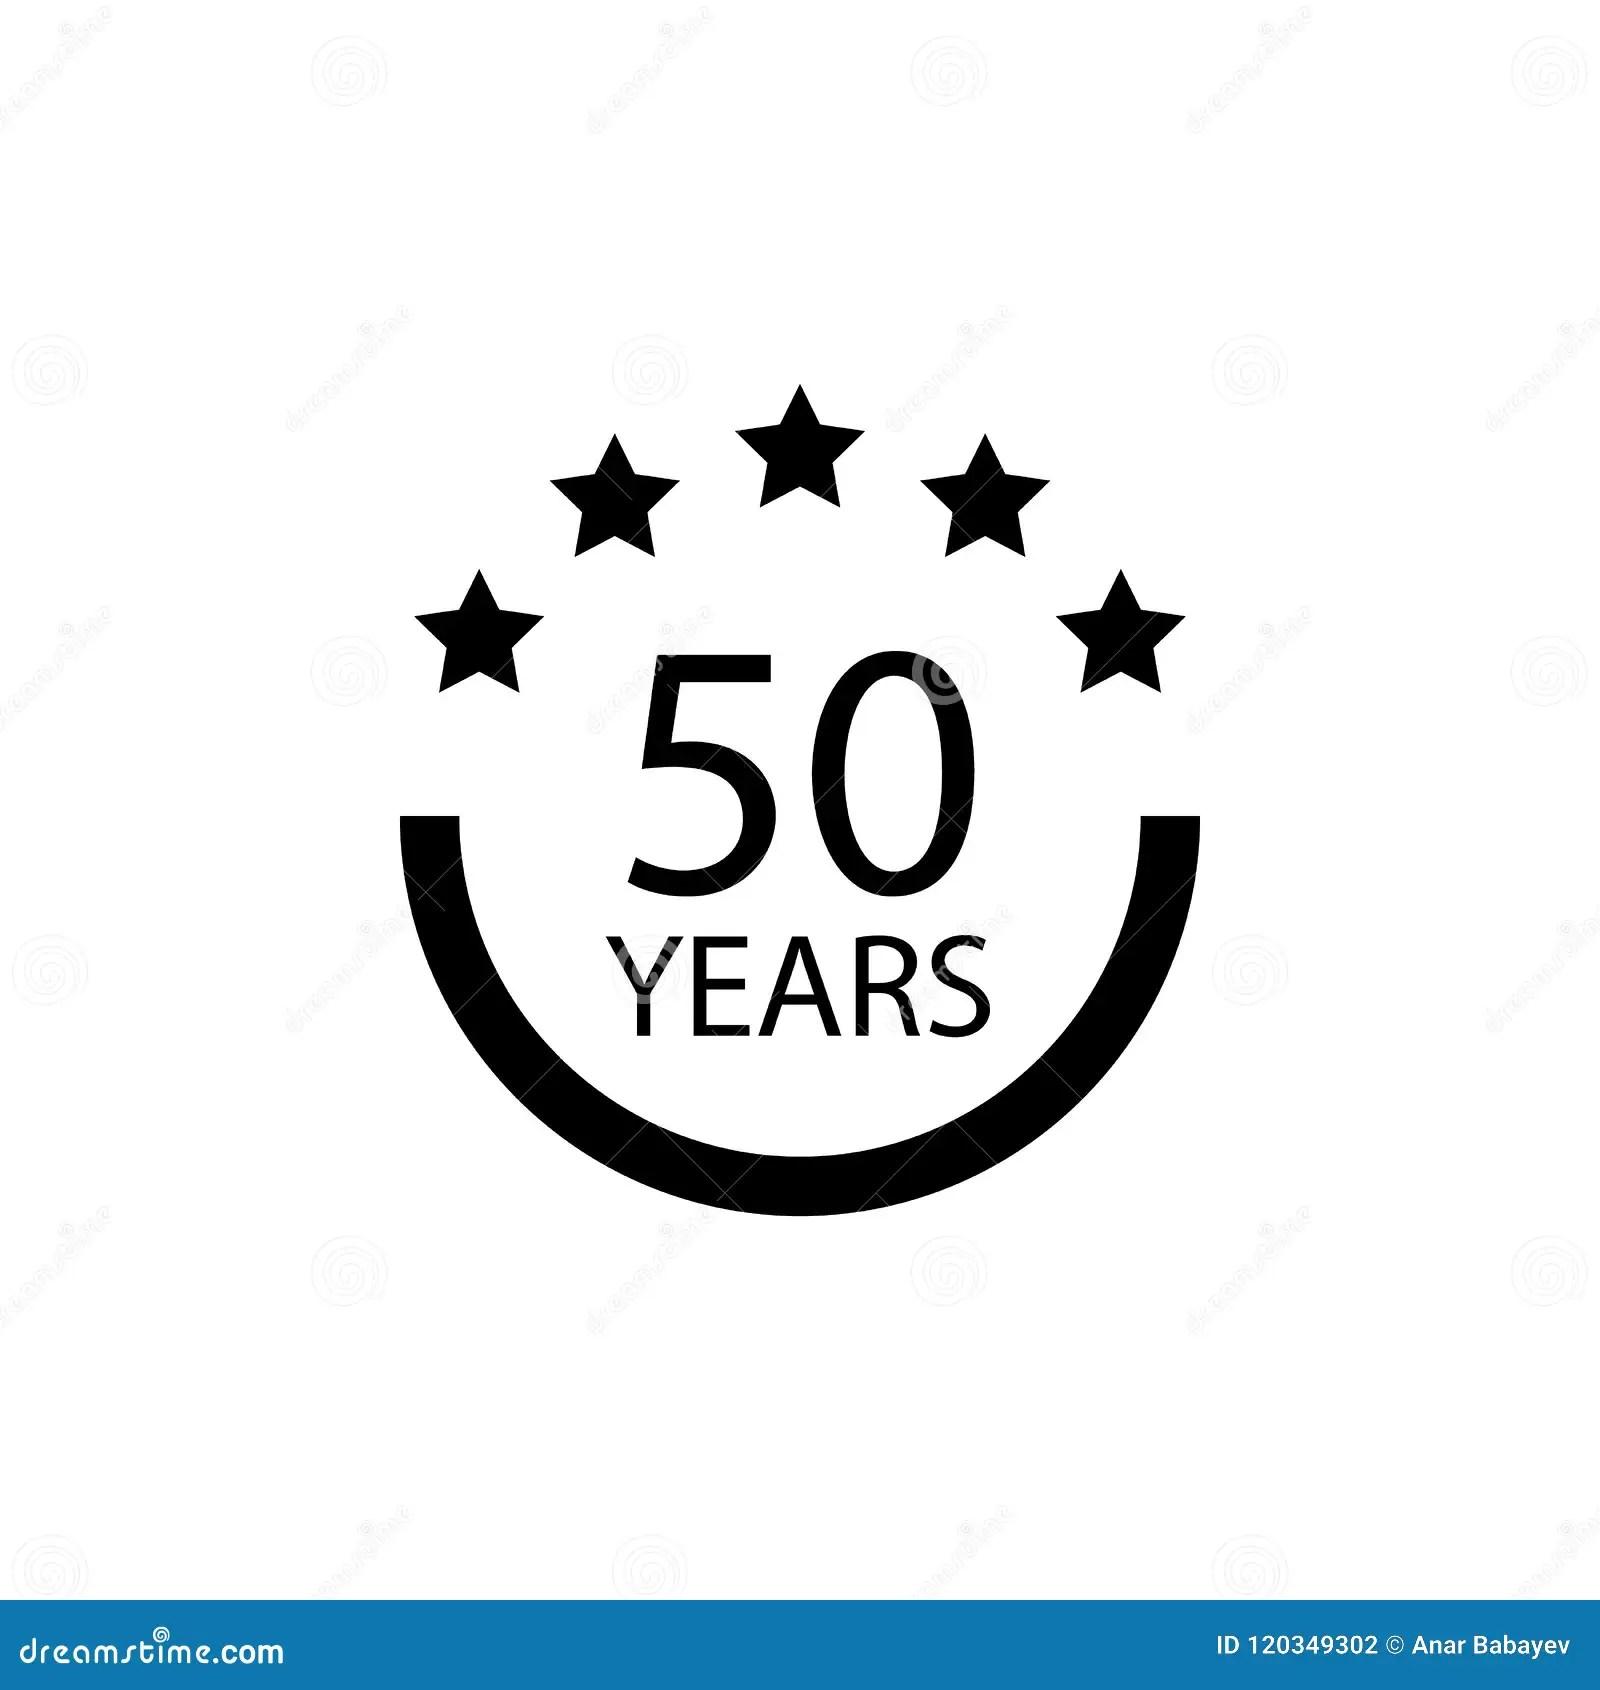 50th Wedding Anniversary Royalty Free Stock Photography